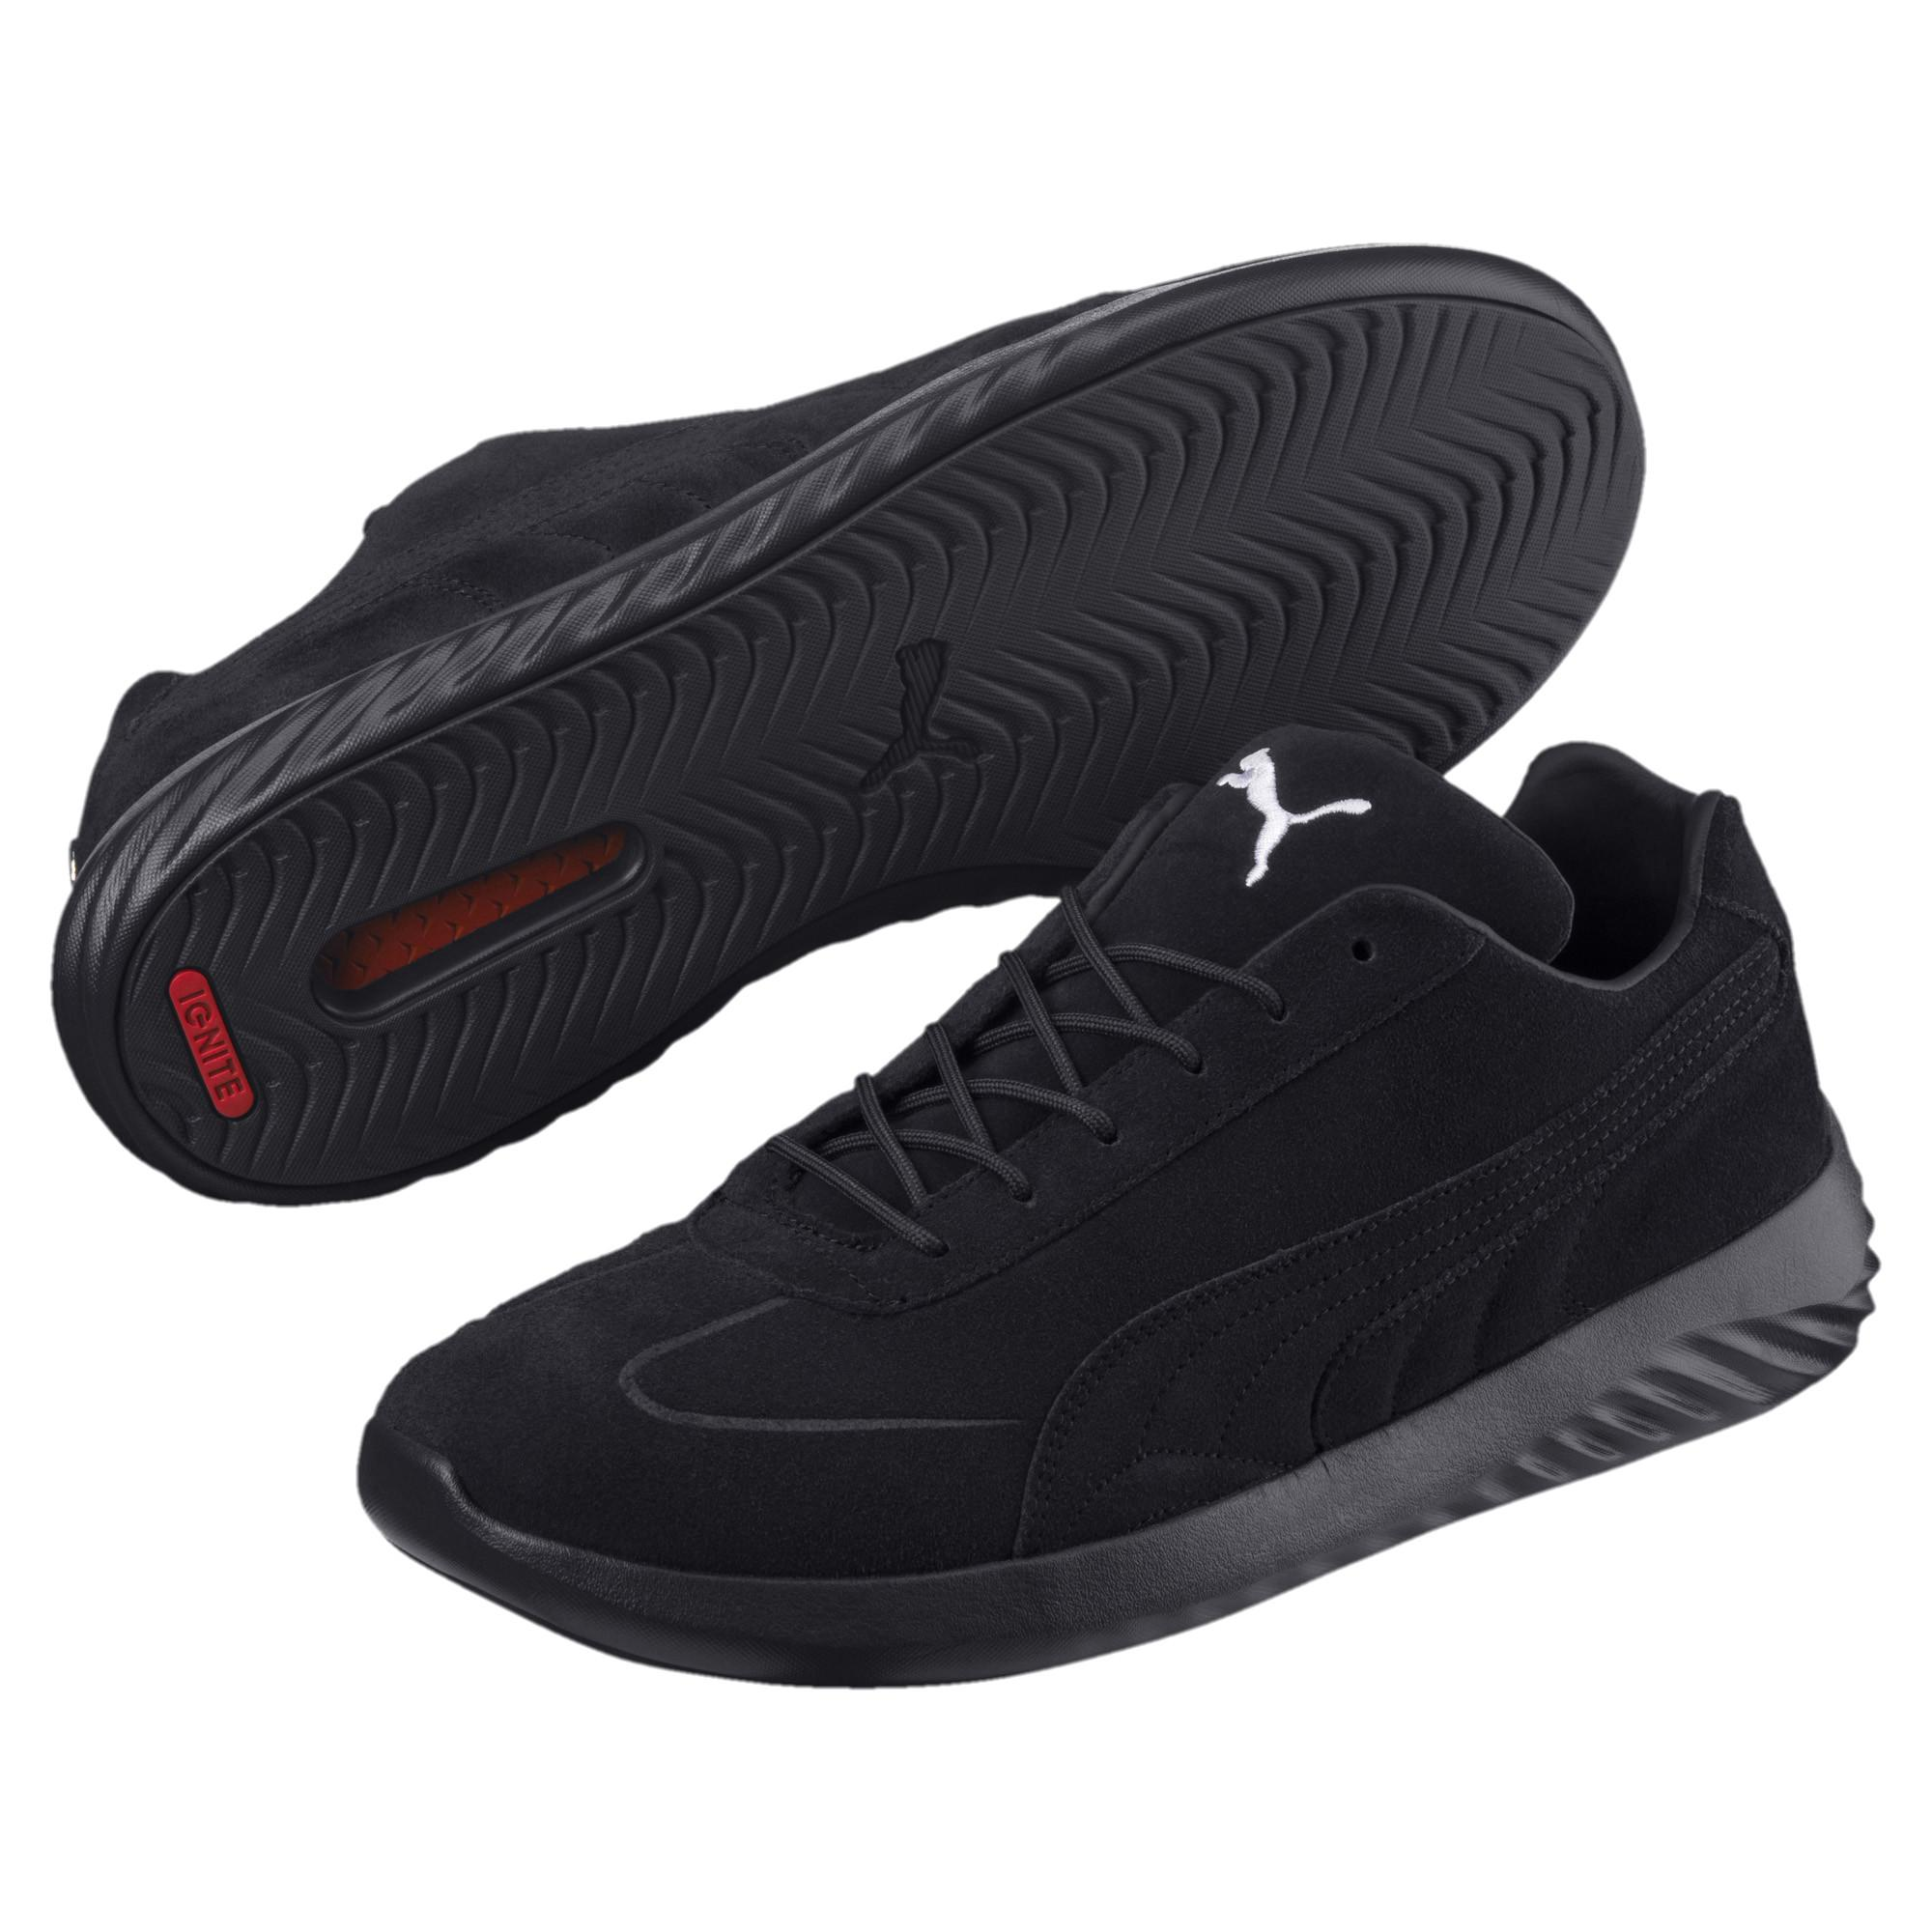 9230a4c103af PUMA - Black Bmw Motorsport Speed Cat Evo Sneakers for Men - Lyst. View  fullscreen